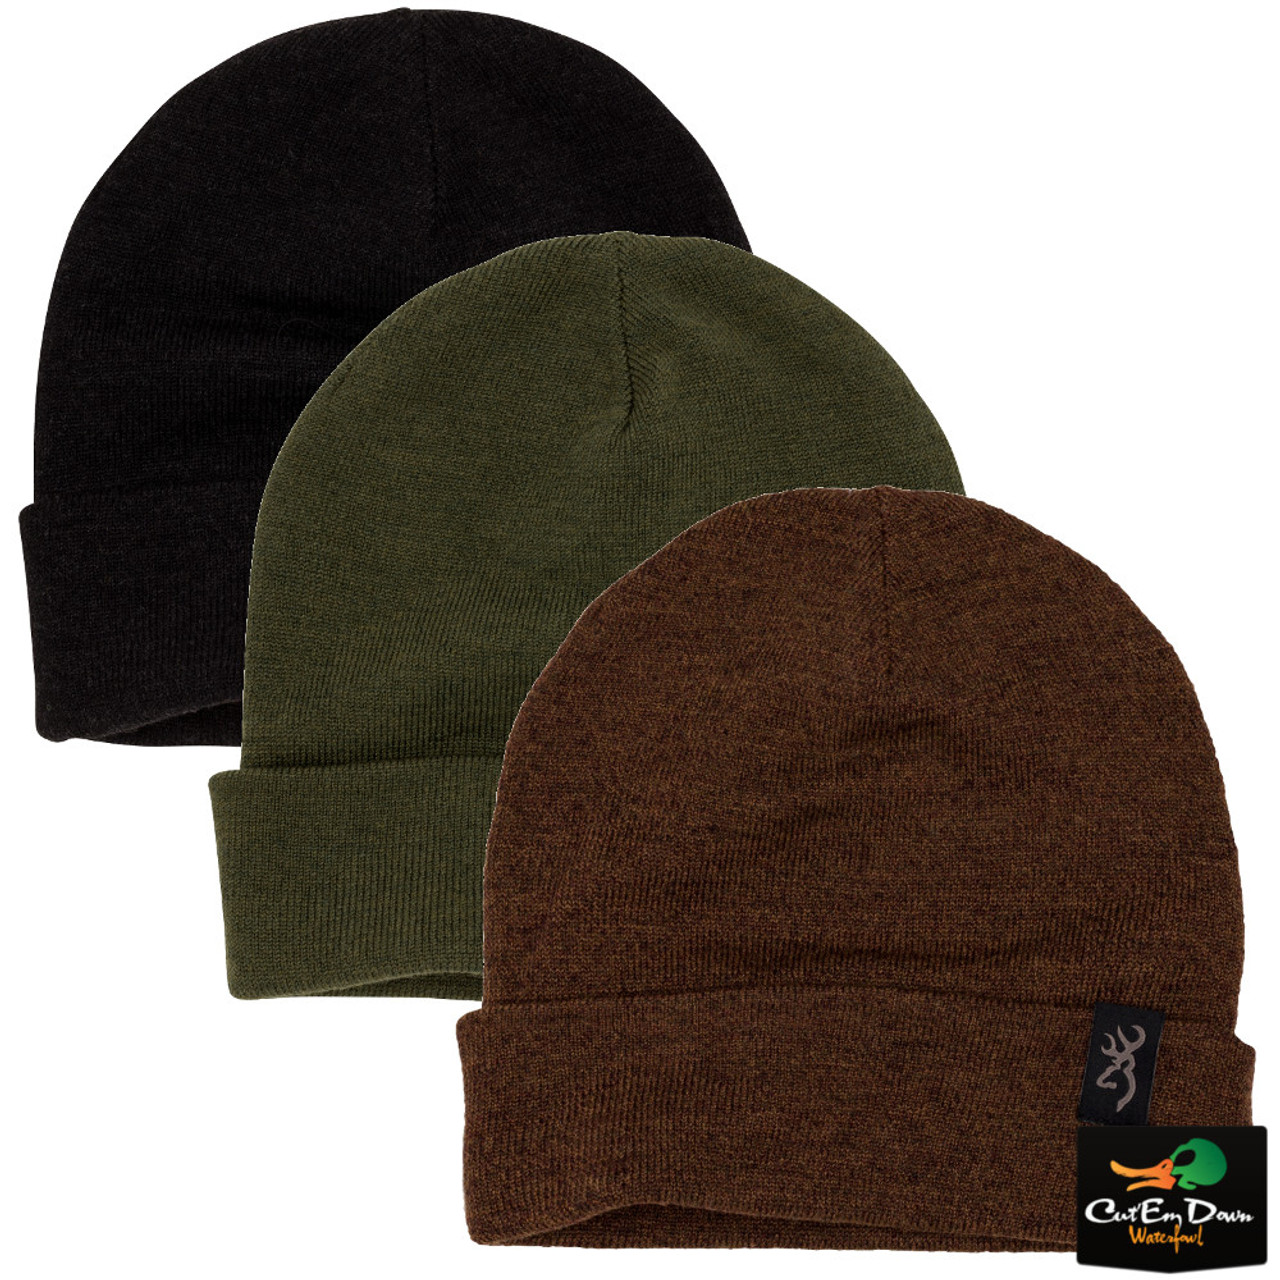 04978304253 Browning High Country Merino Wool Reversible Beanie